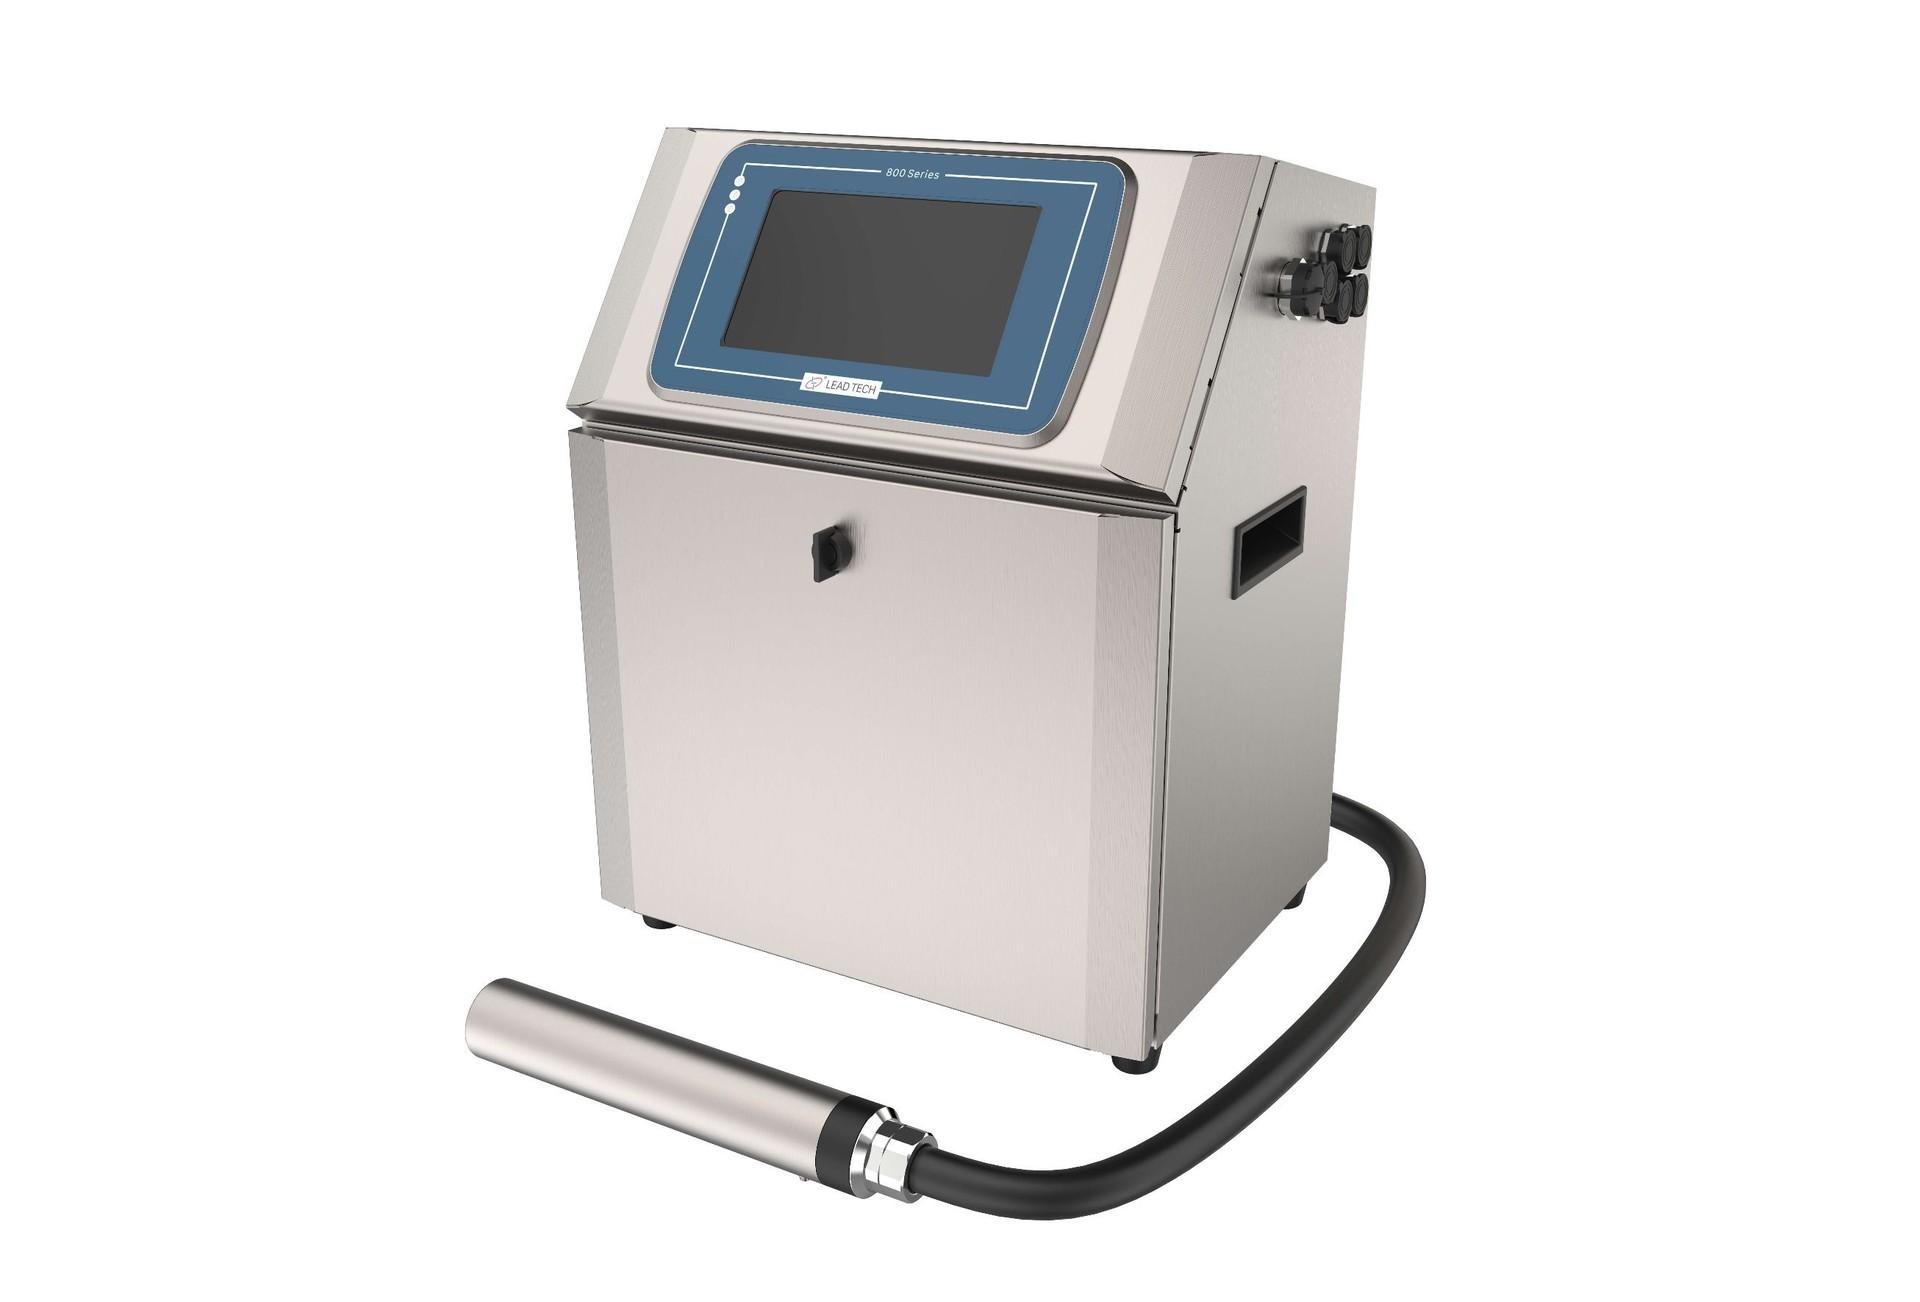 Lead Tech Lt800 Digital Printer for Cable Printing